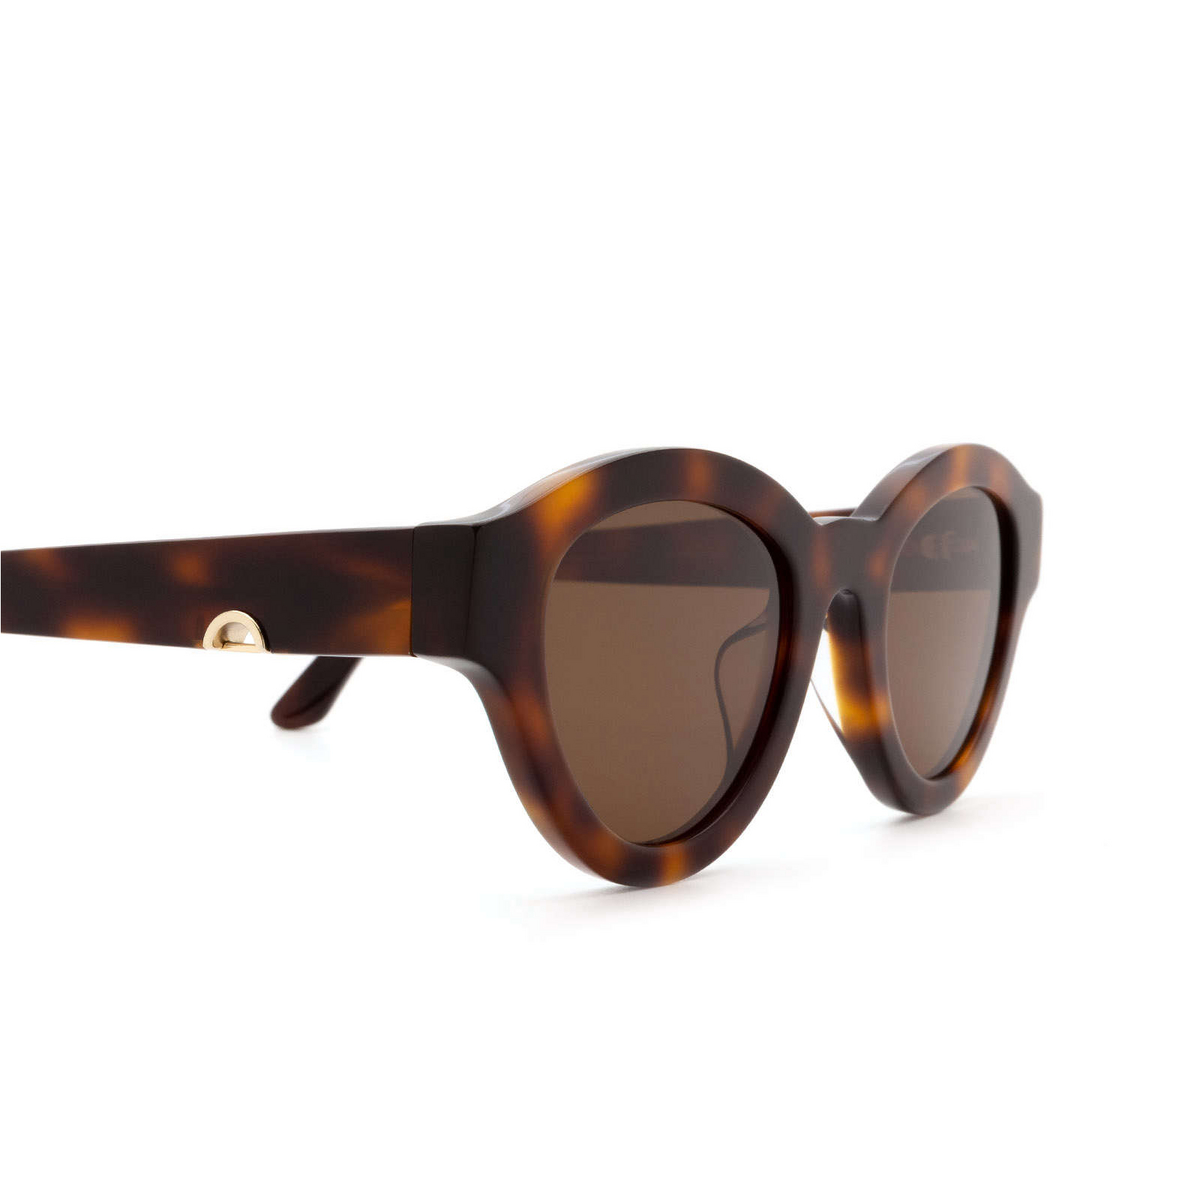 Huma® Cat-eye Sunglasses: Dug color Havana 00 - three-quarters view.